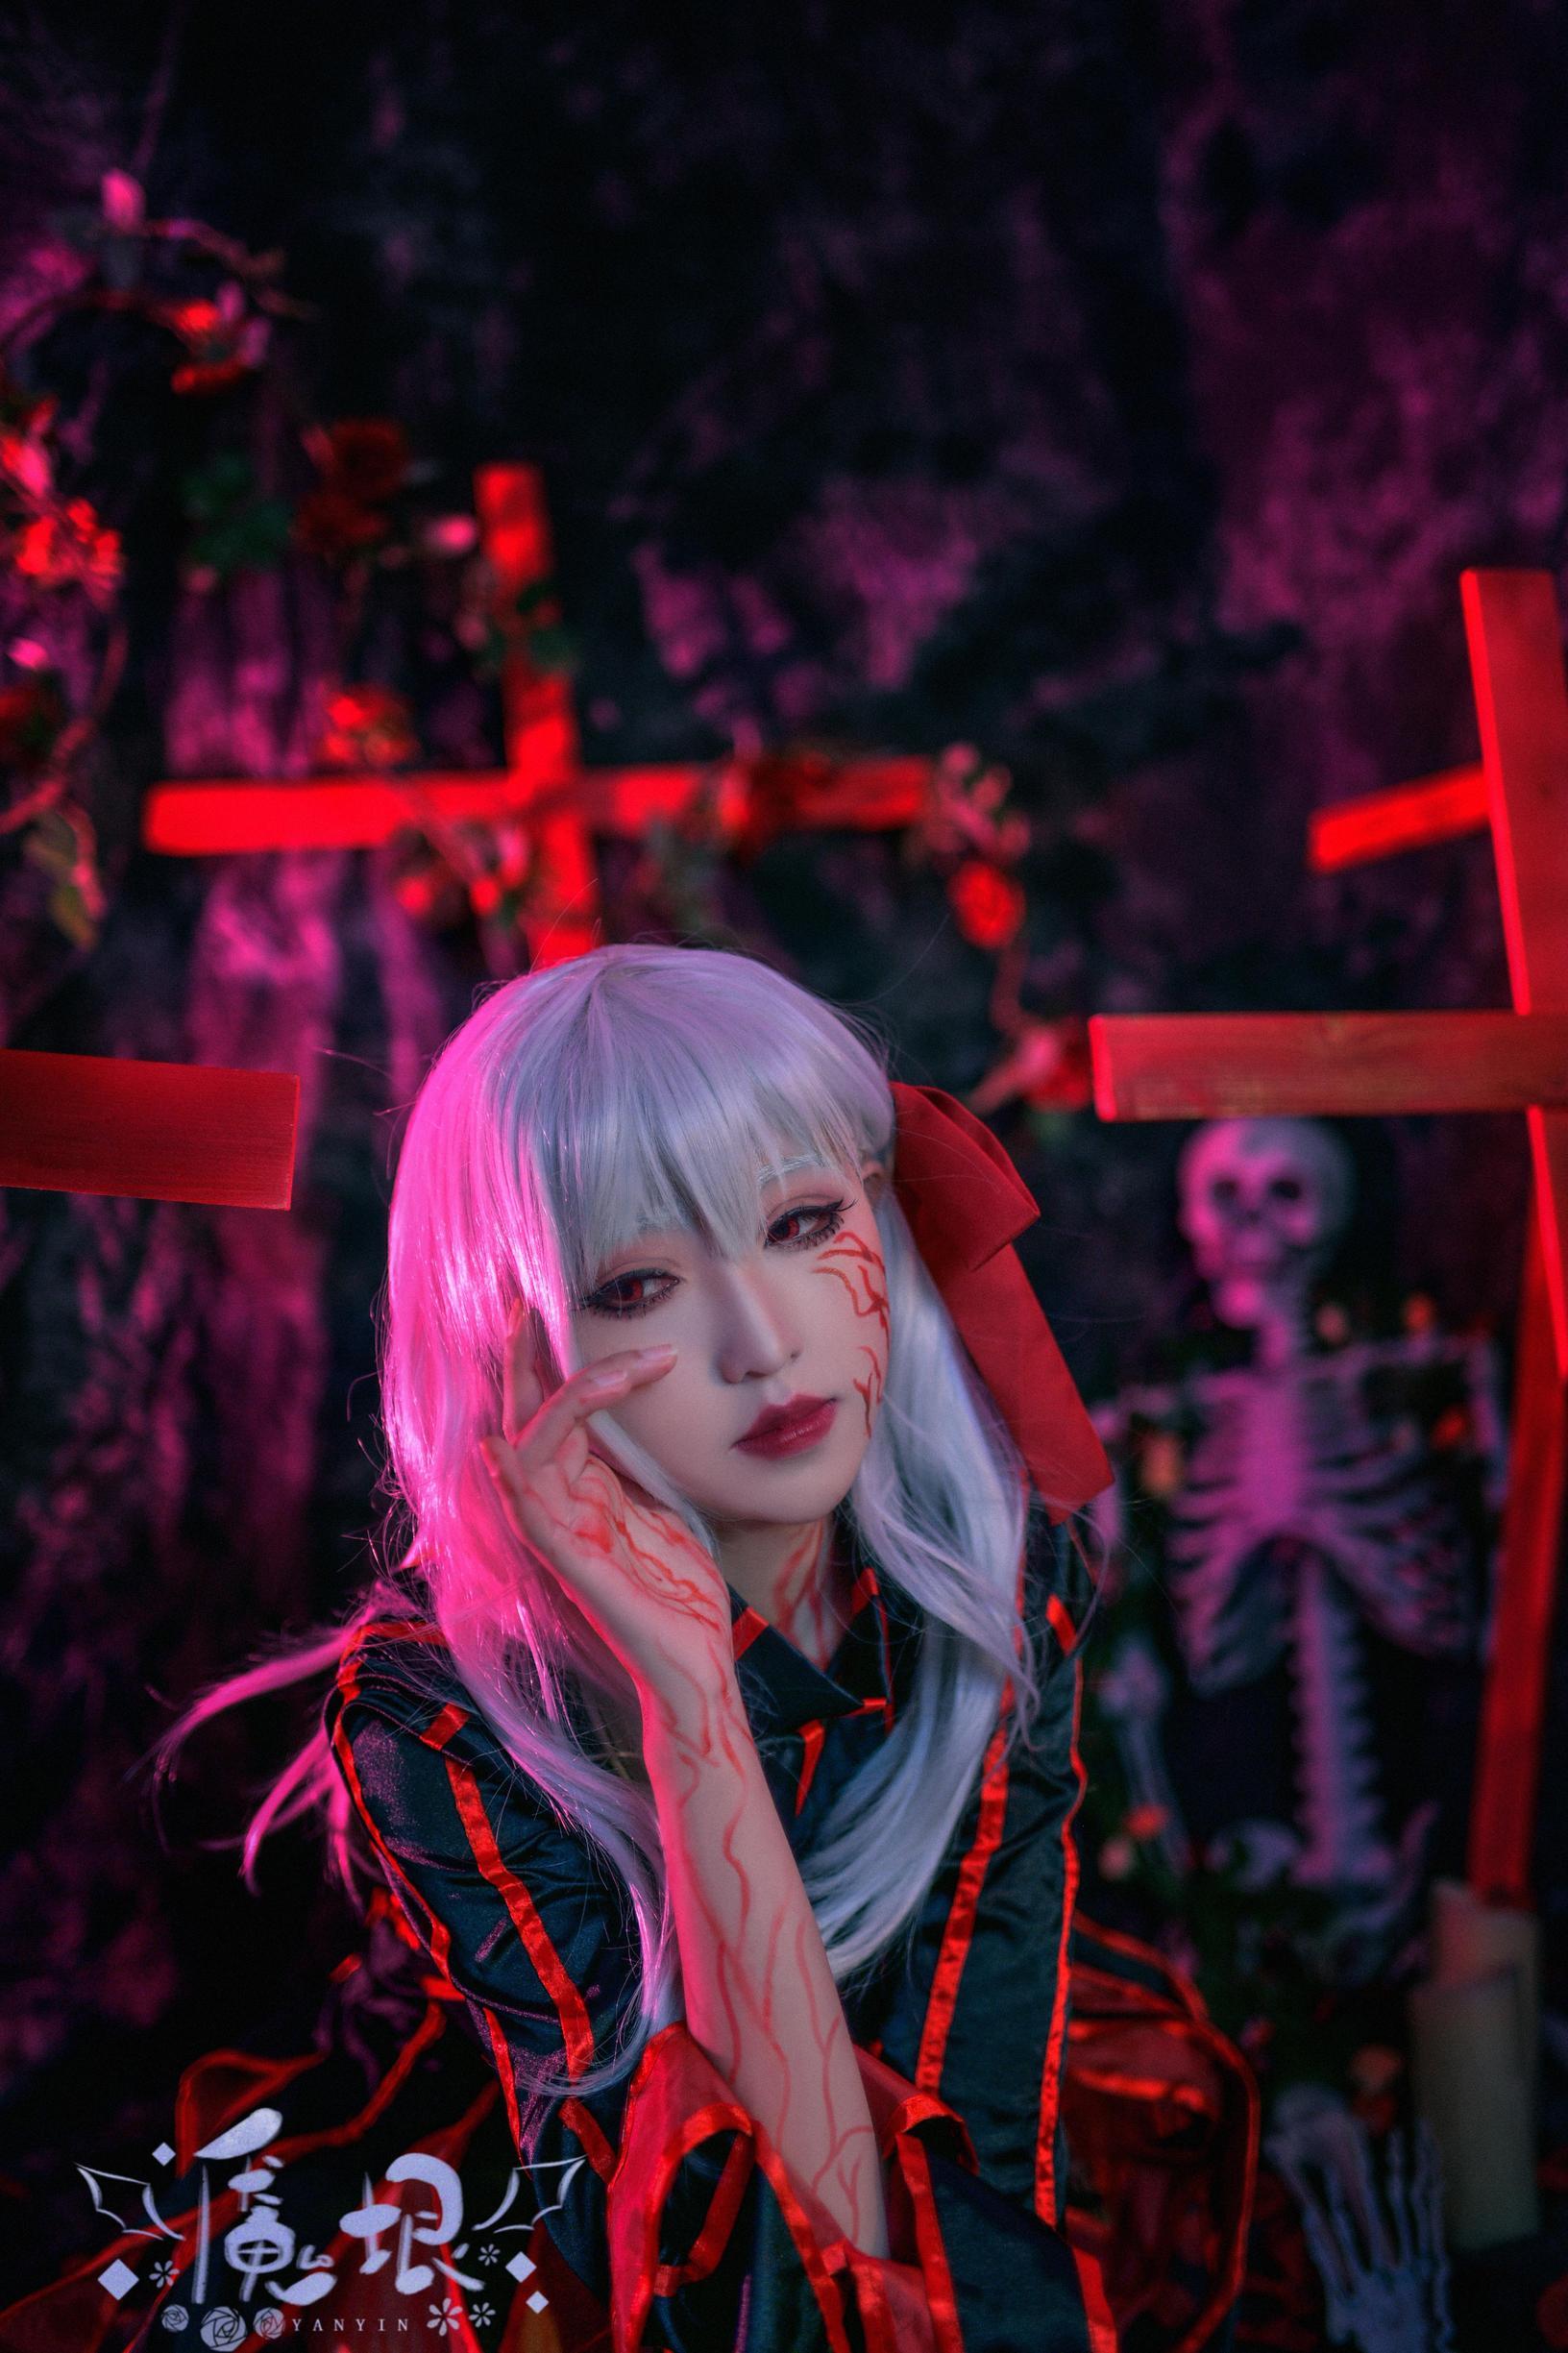 《FATE/GRAND ORDER》正片cosplay【CN:魇恨哒~】-第2张